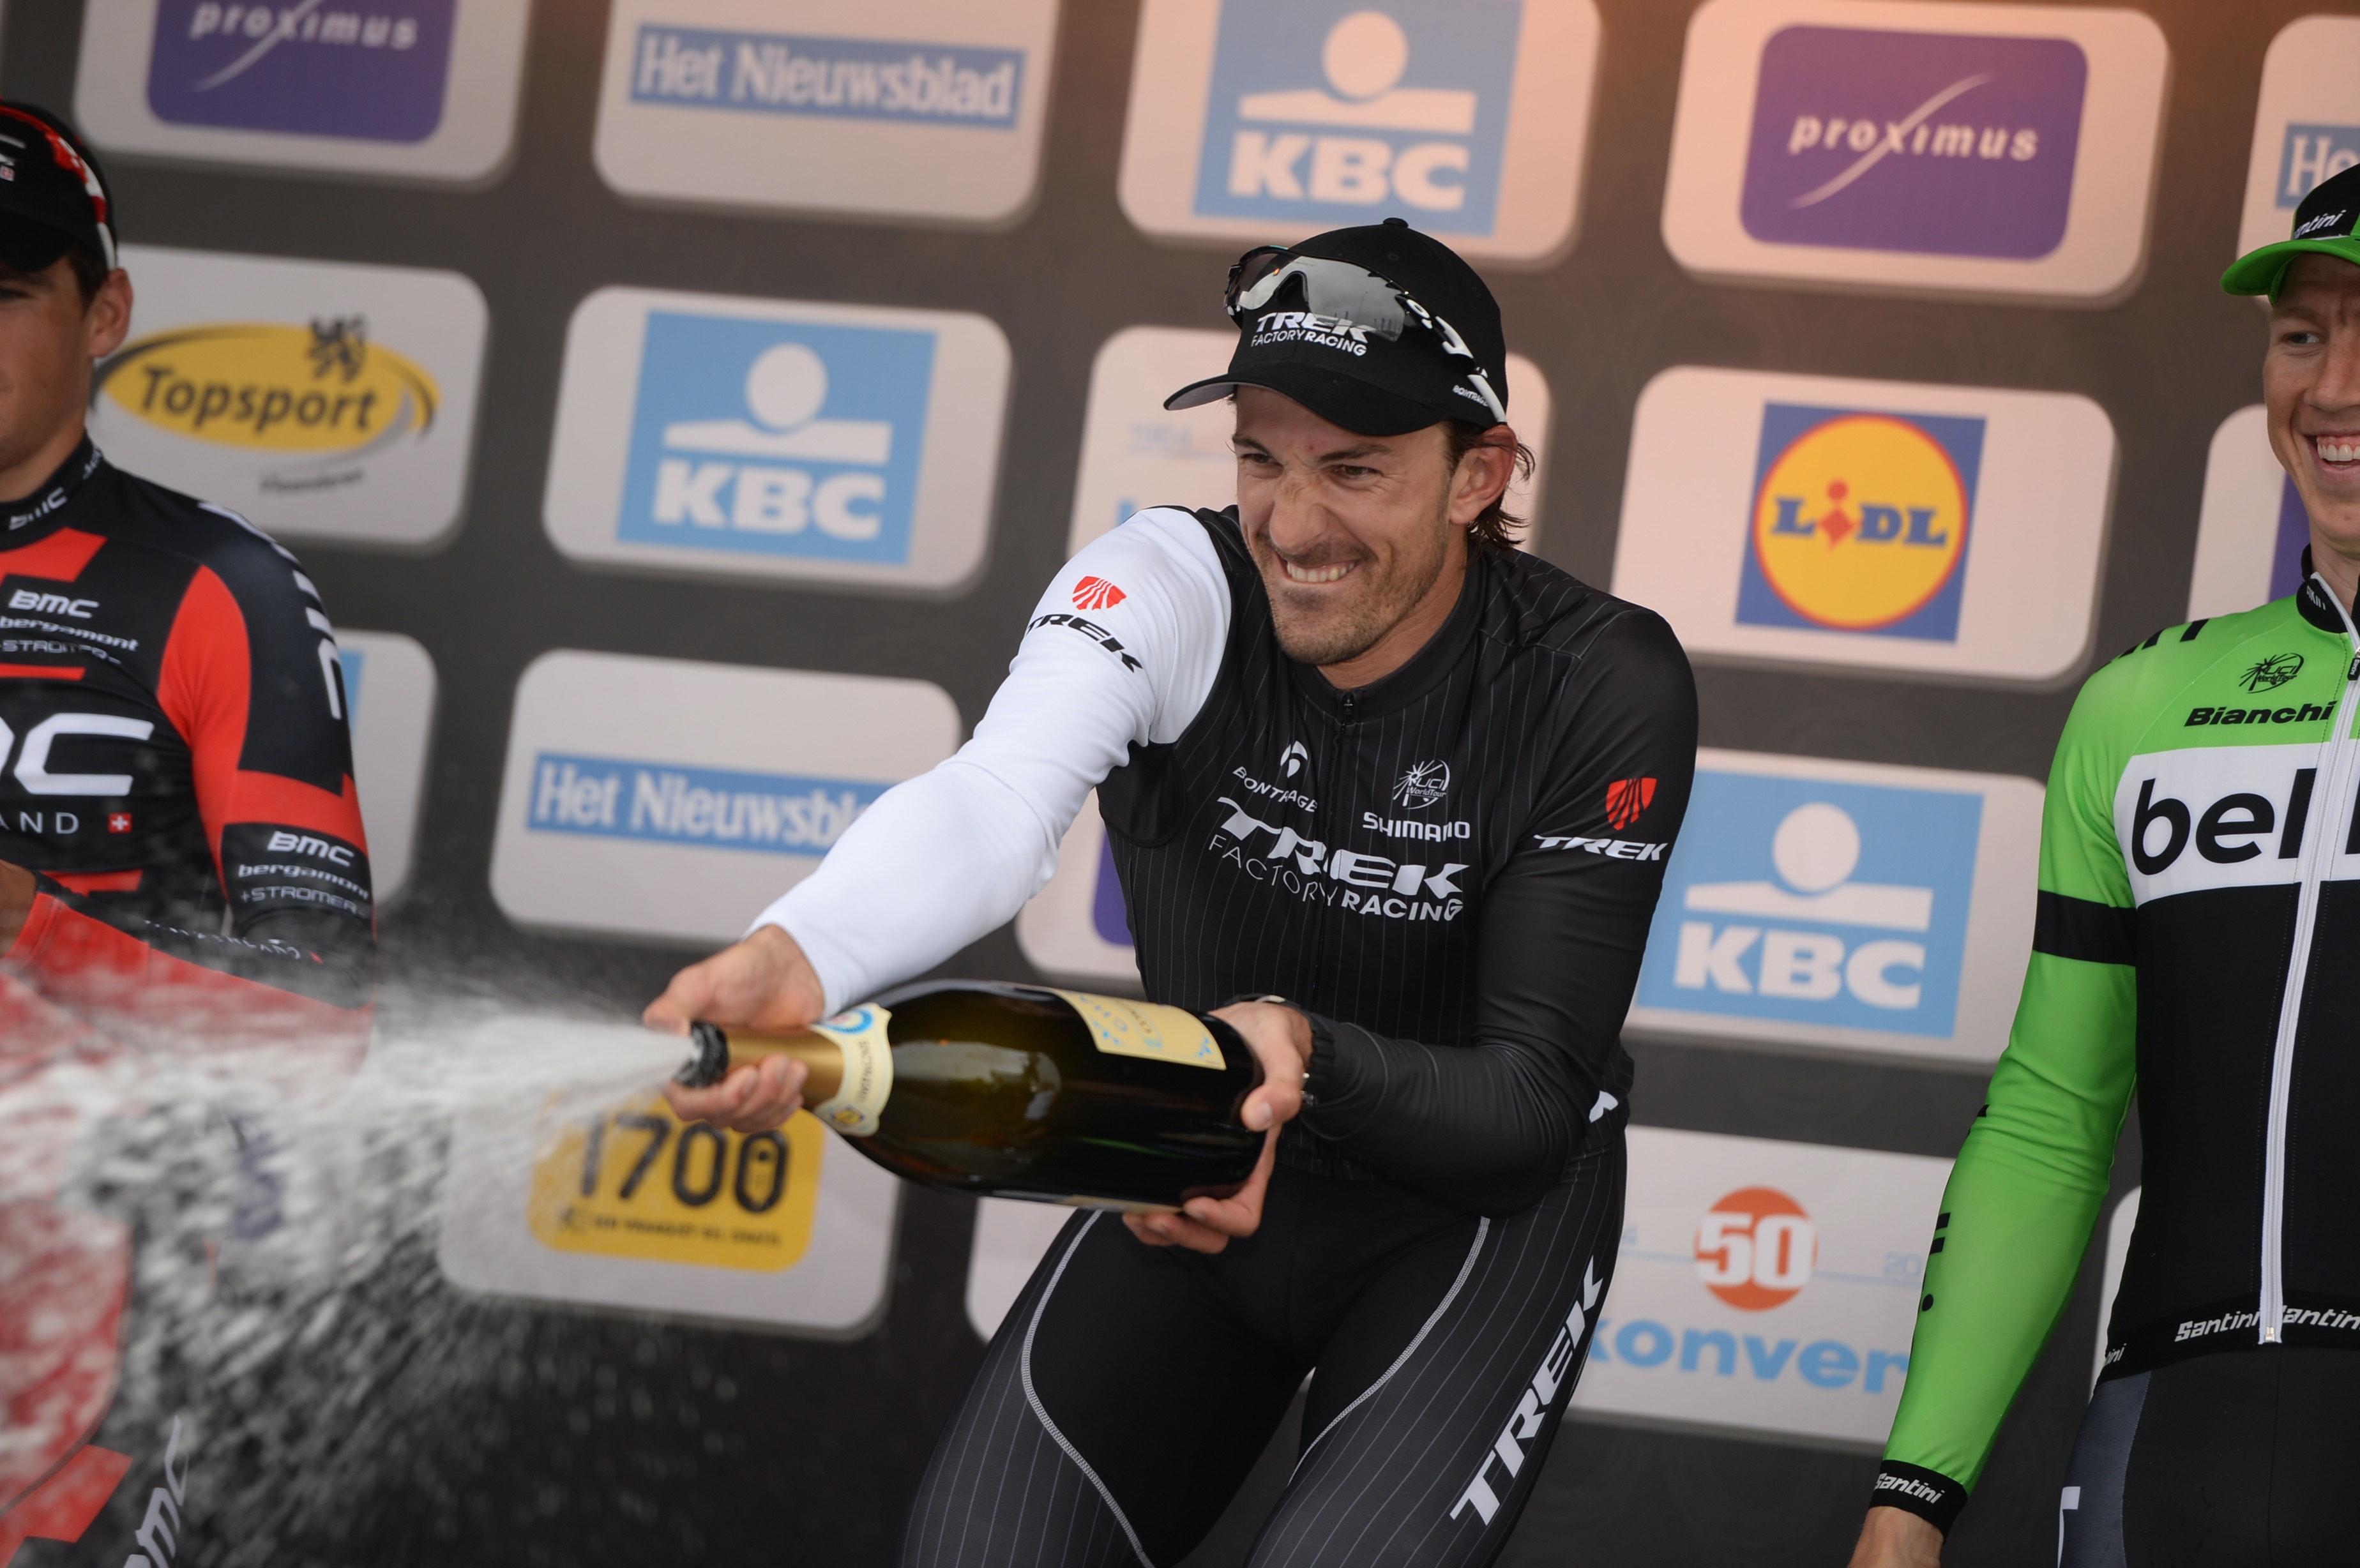 Fabian Cancellara, Trek Factory Racing, champagne, podium, Tour of Flanders, 2014, pic: Sirotti